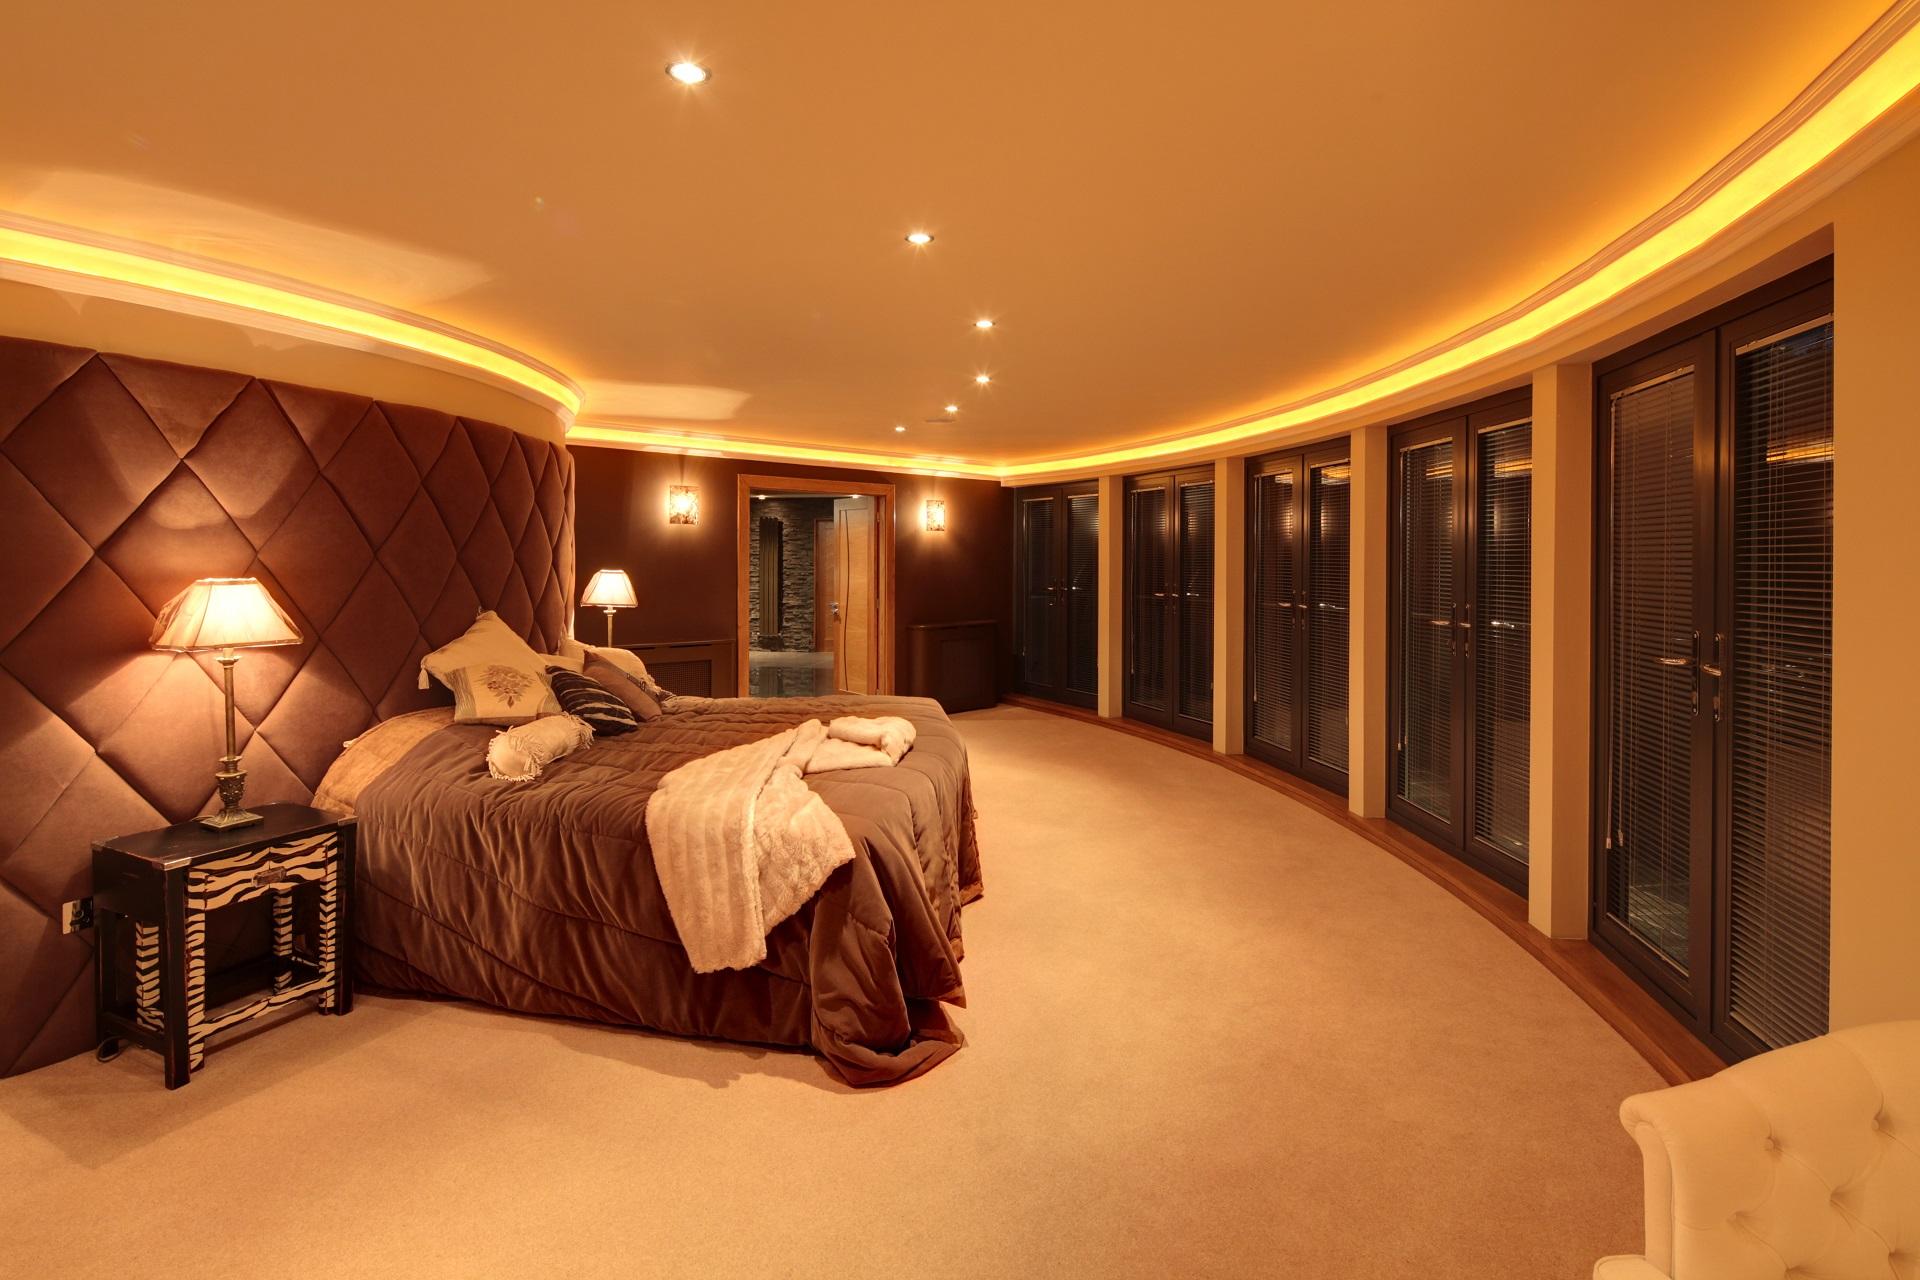 circular bedroom suite, hall view. Luxury homes by Guy Phoenix